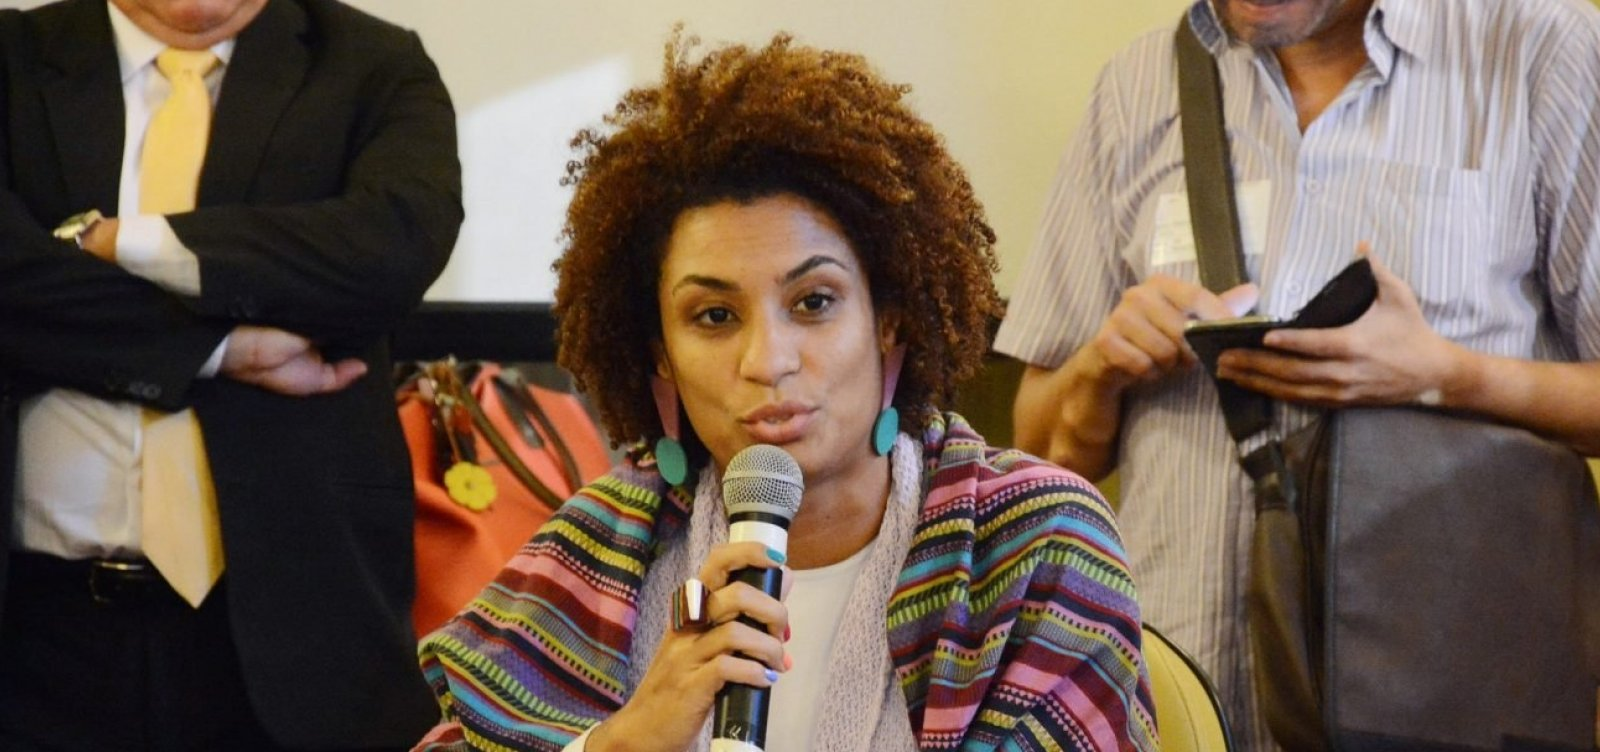 MP diz ter identificado tipo físico de assassino de Marielle Franco